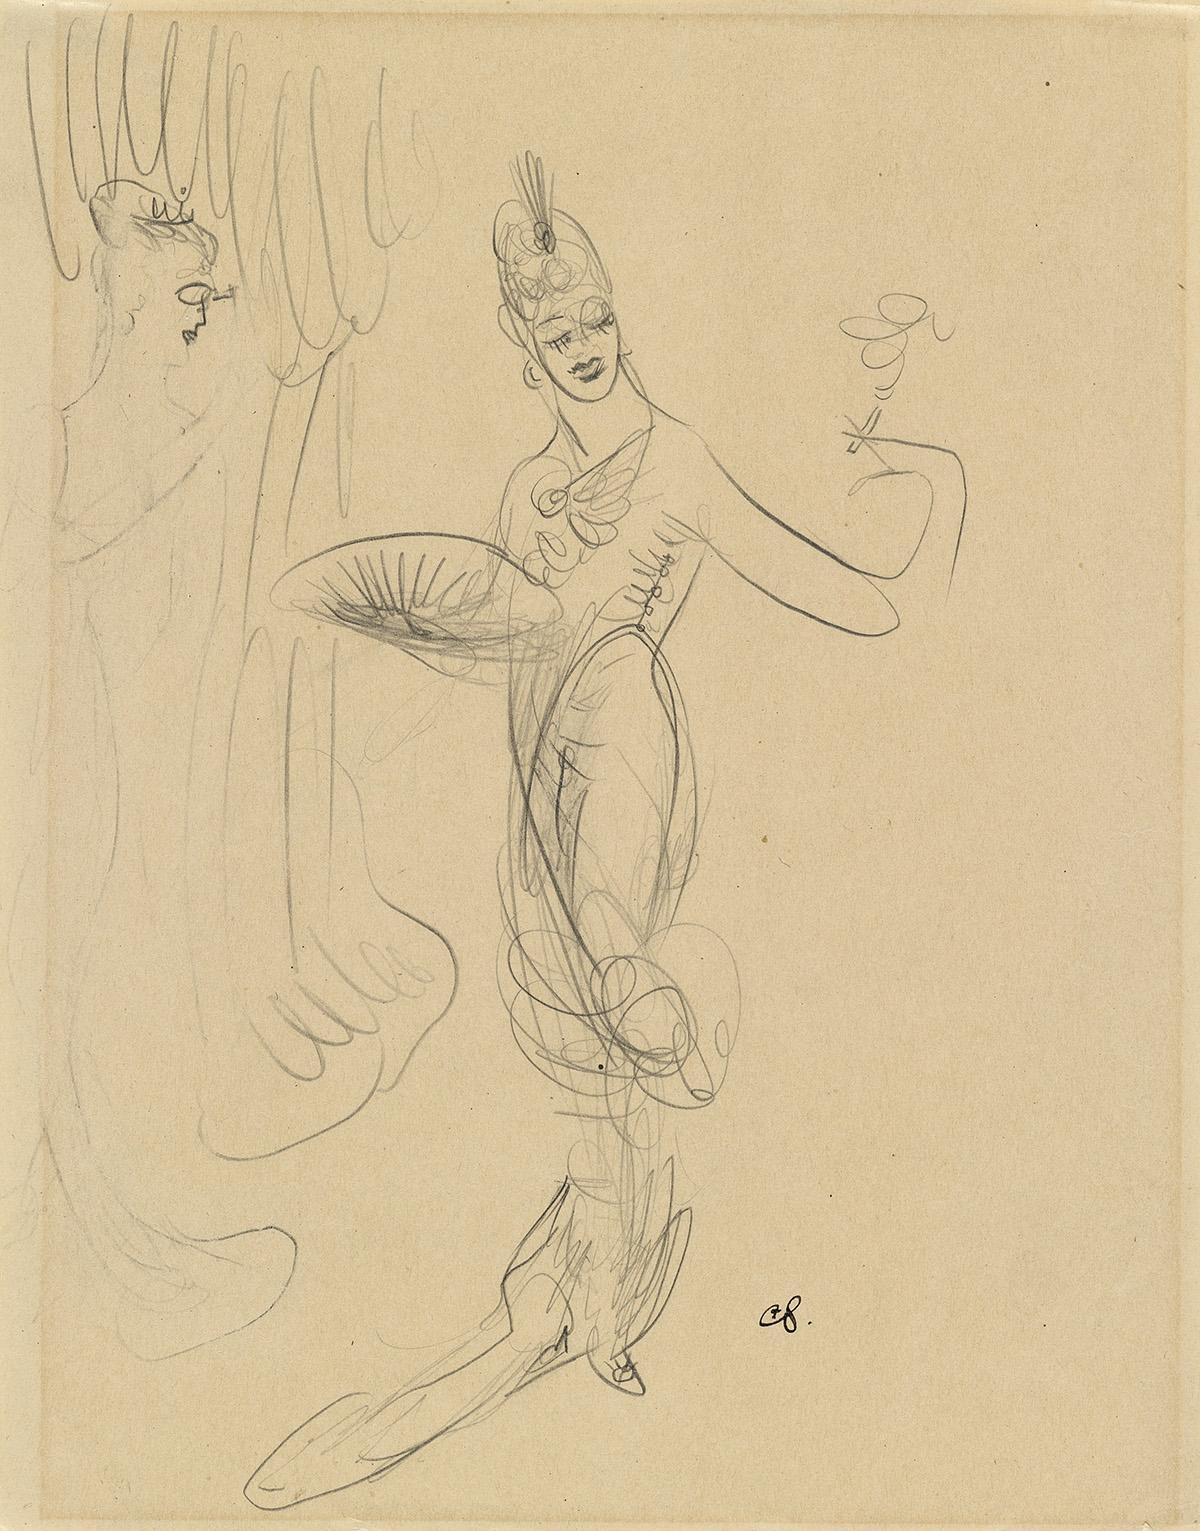 CARL-SPRINCHORN-Two-pencil-drawings